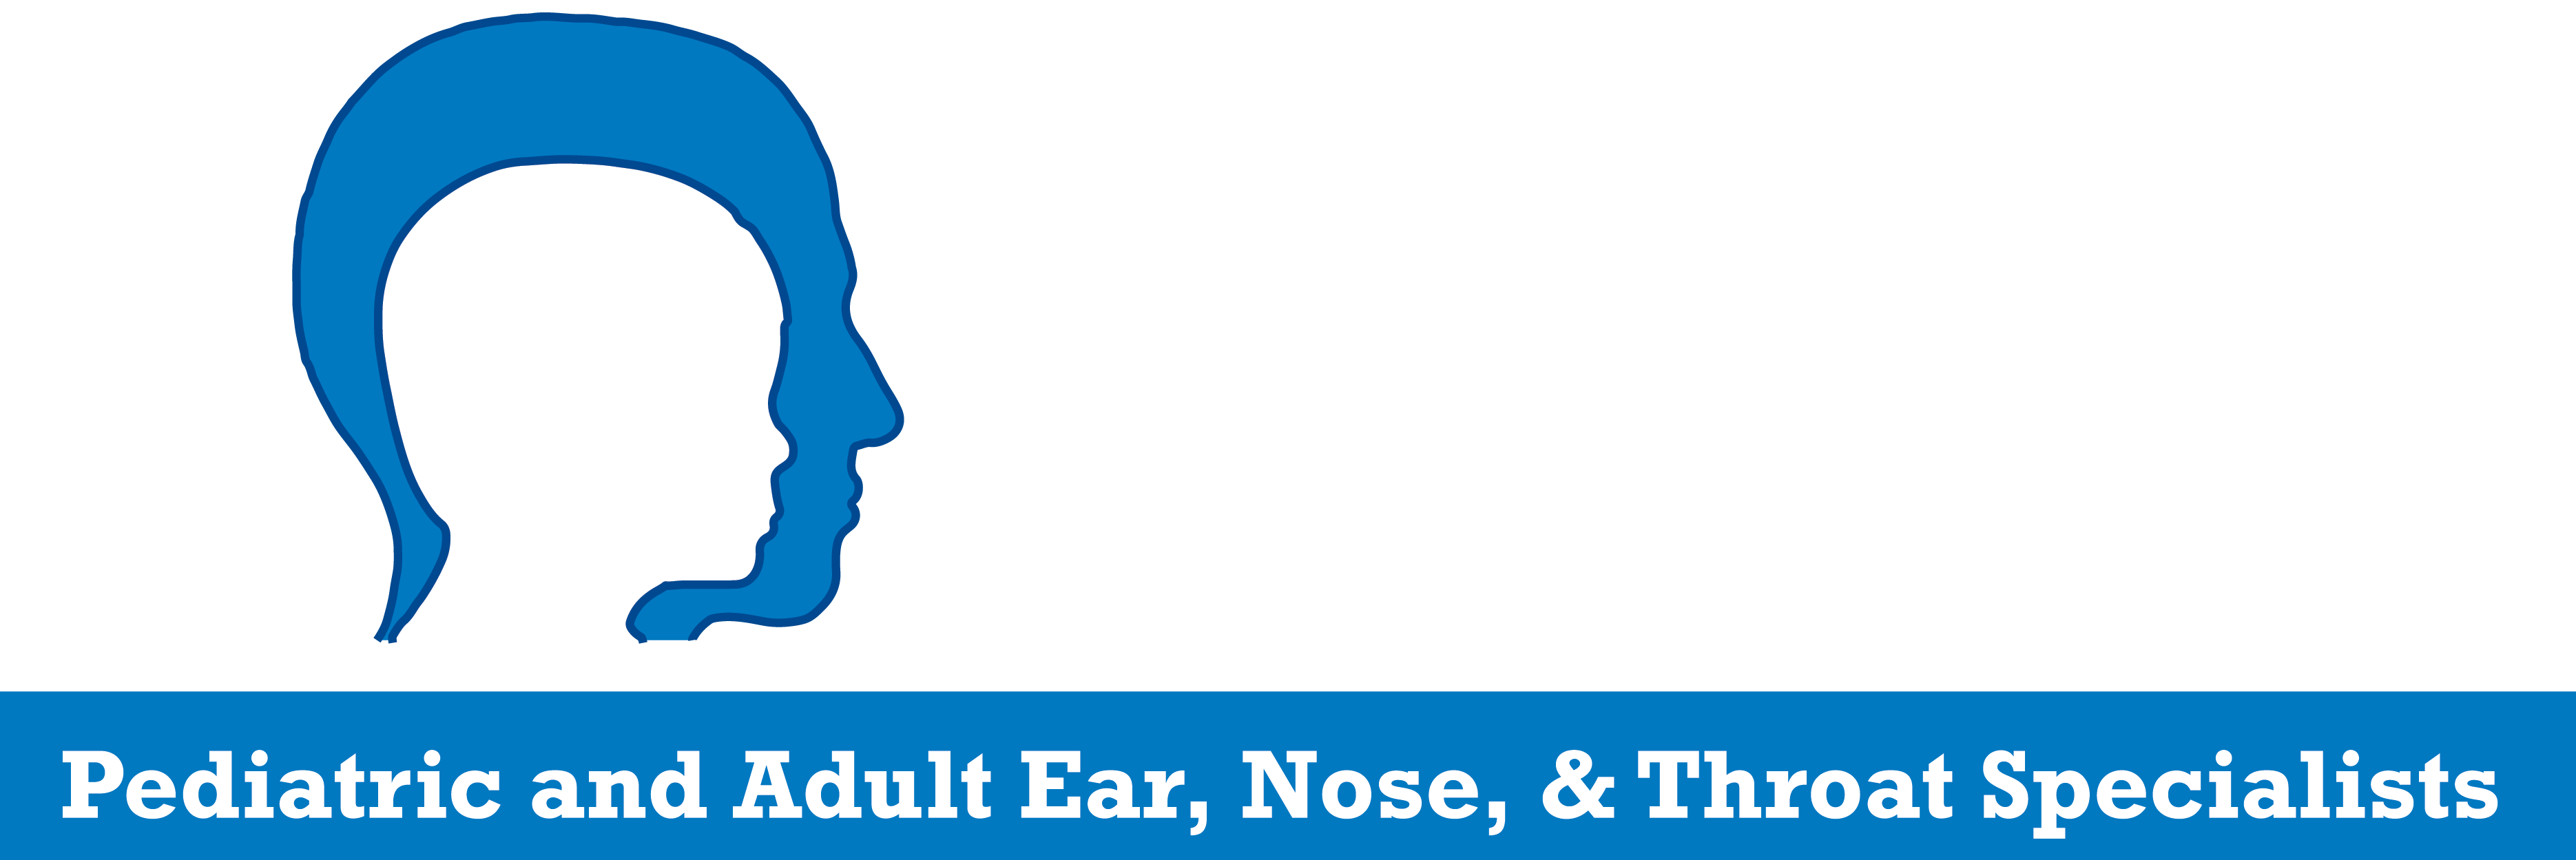 Otolaryngology Specialists of North Texas